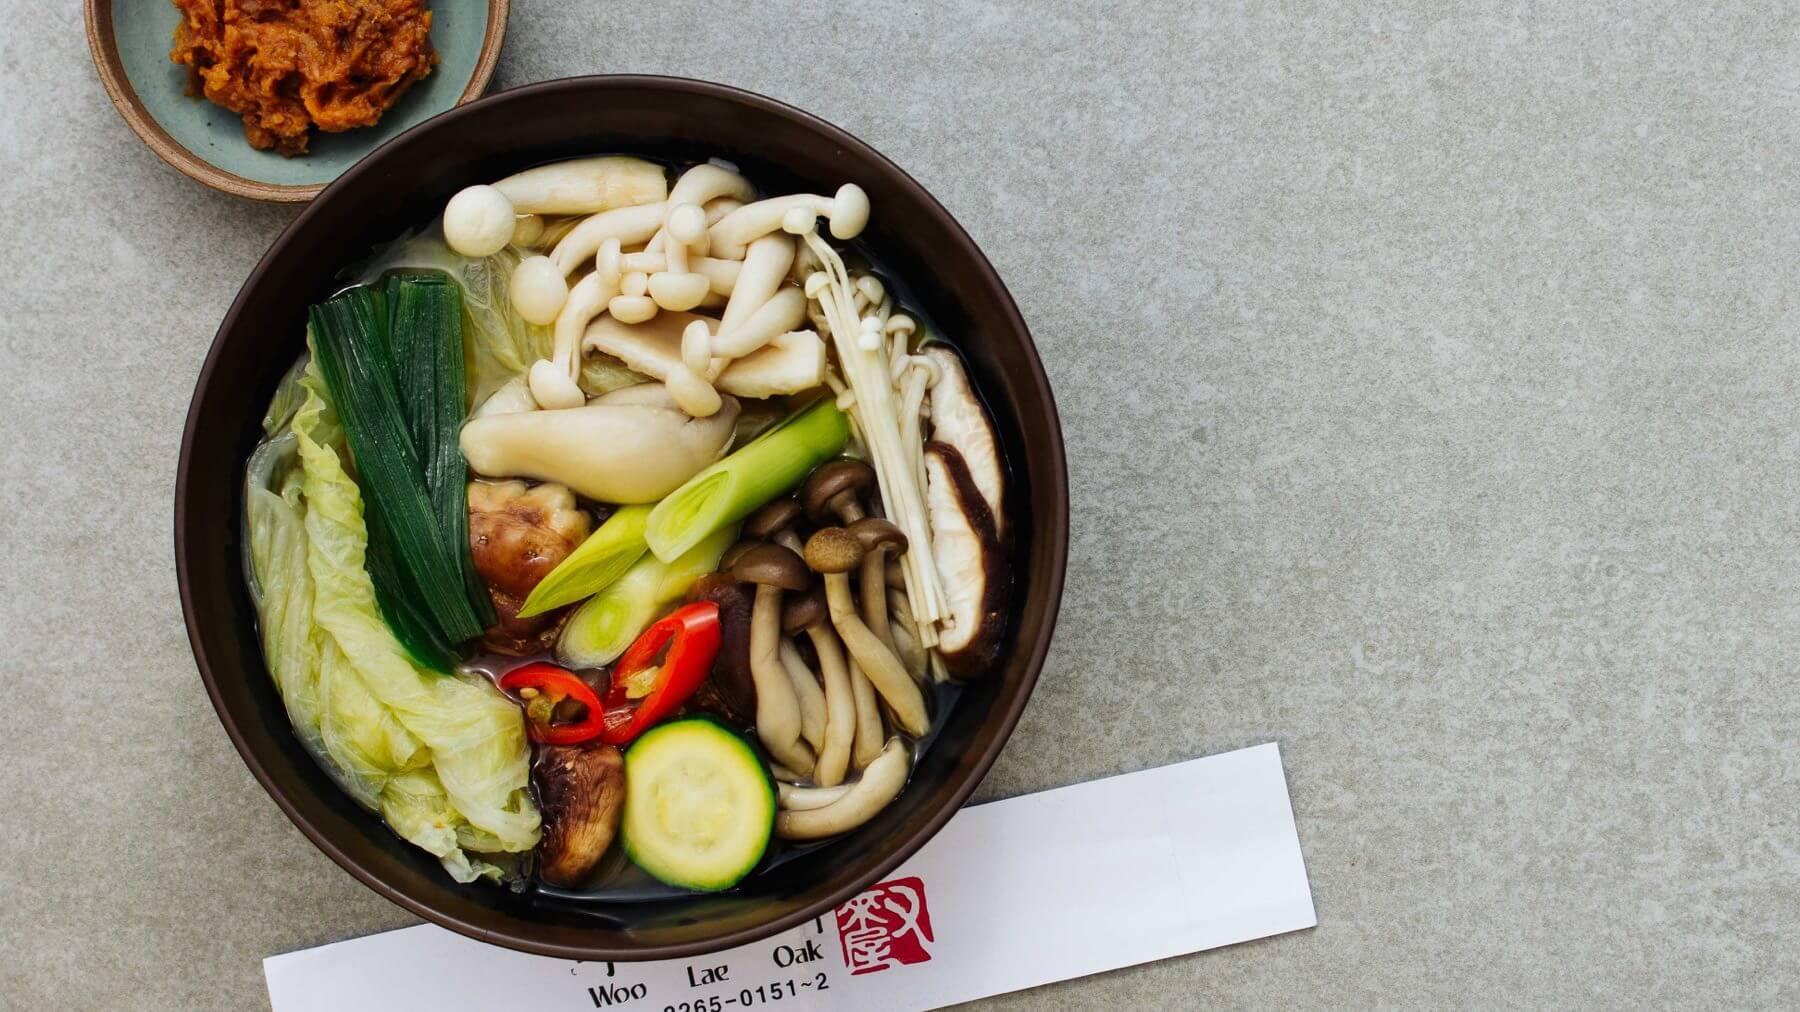 Koreanischer Hot Pot mit Pilzen und Tofu – Doenjang Beoseot Jeongol